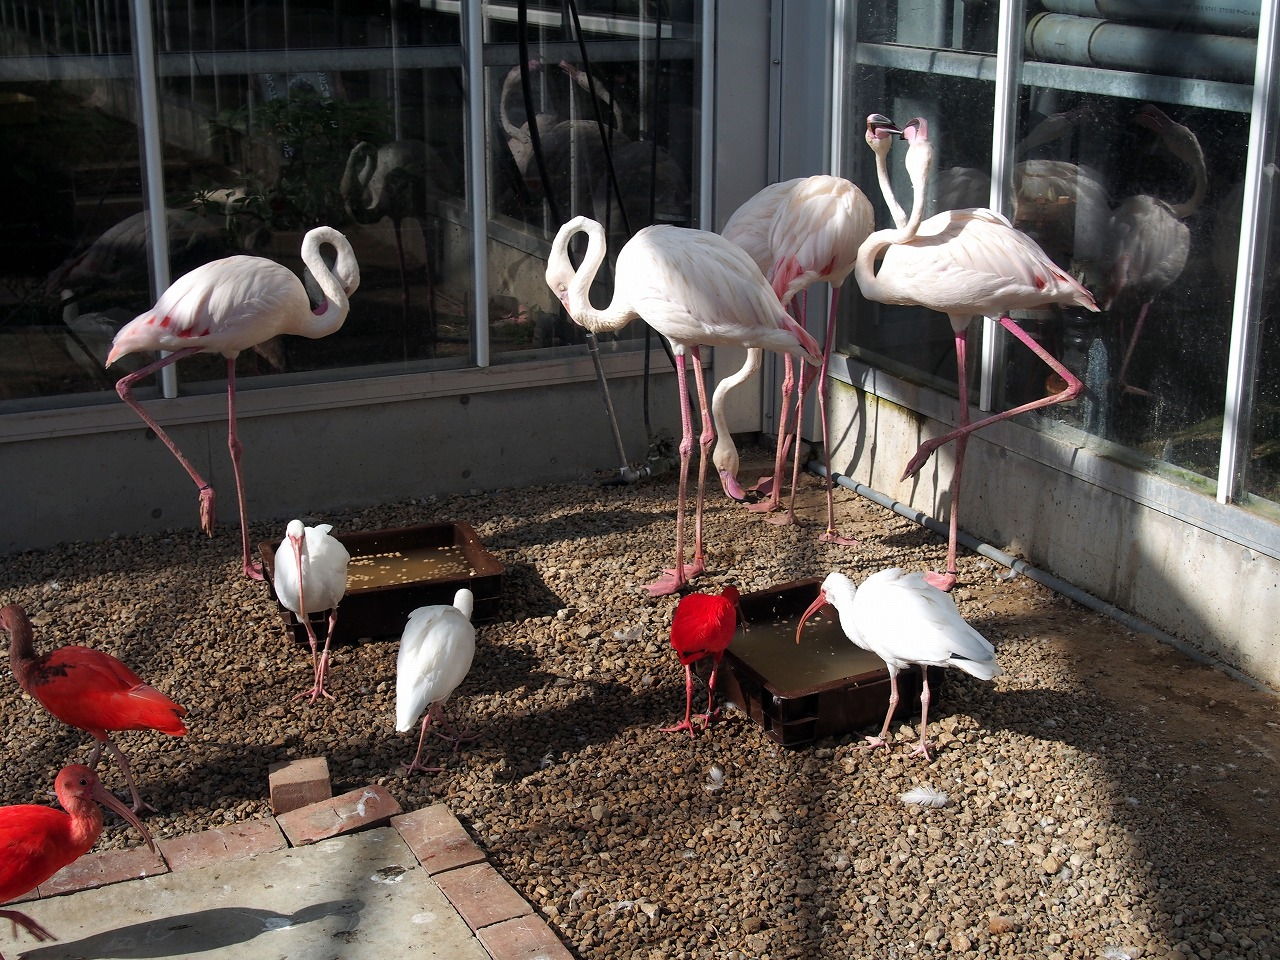 Flamingo_20140913-01.jpg